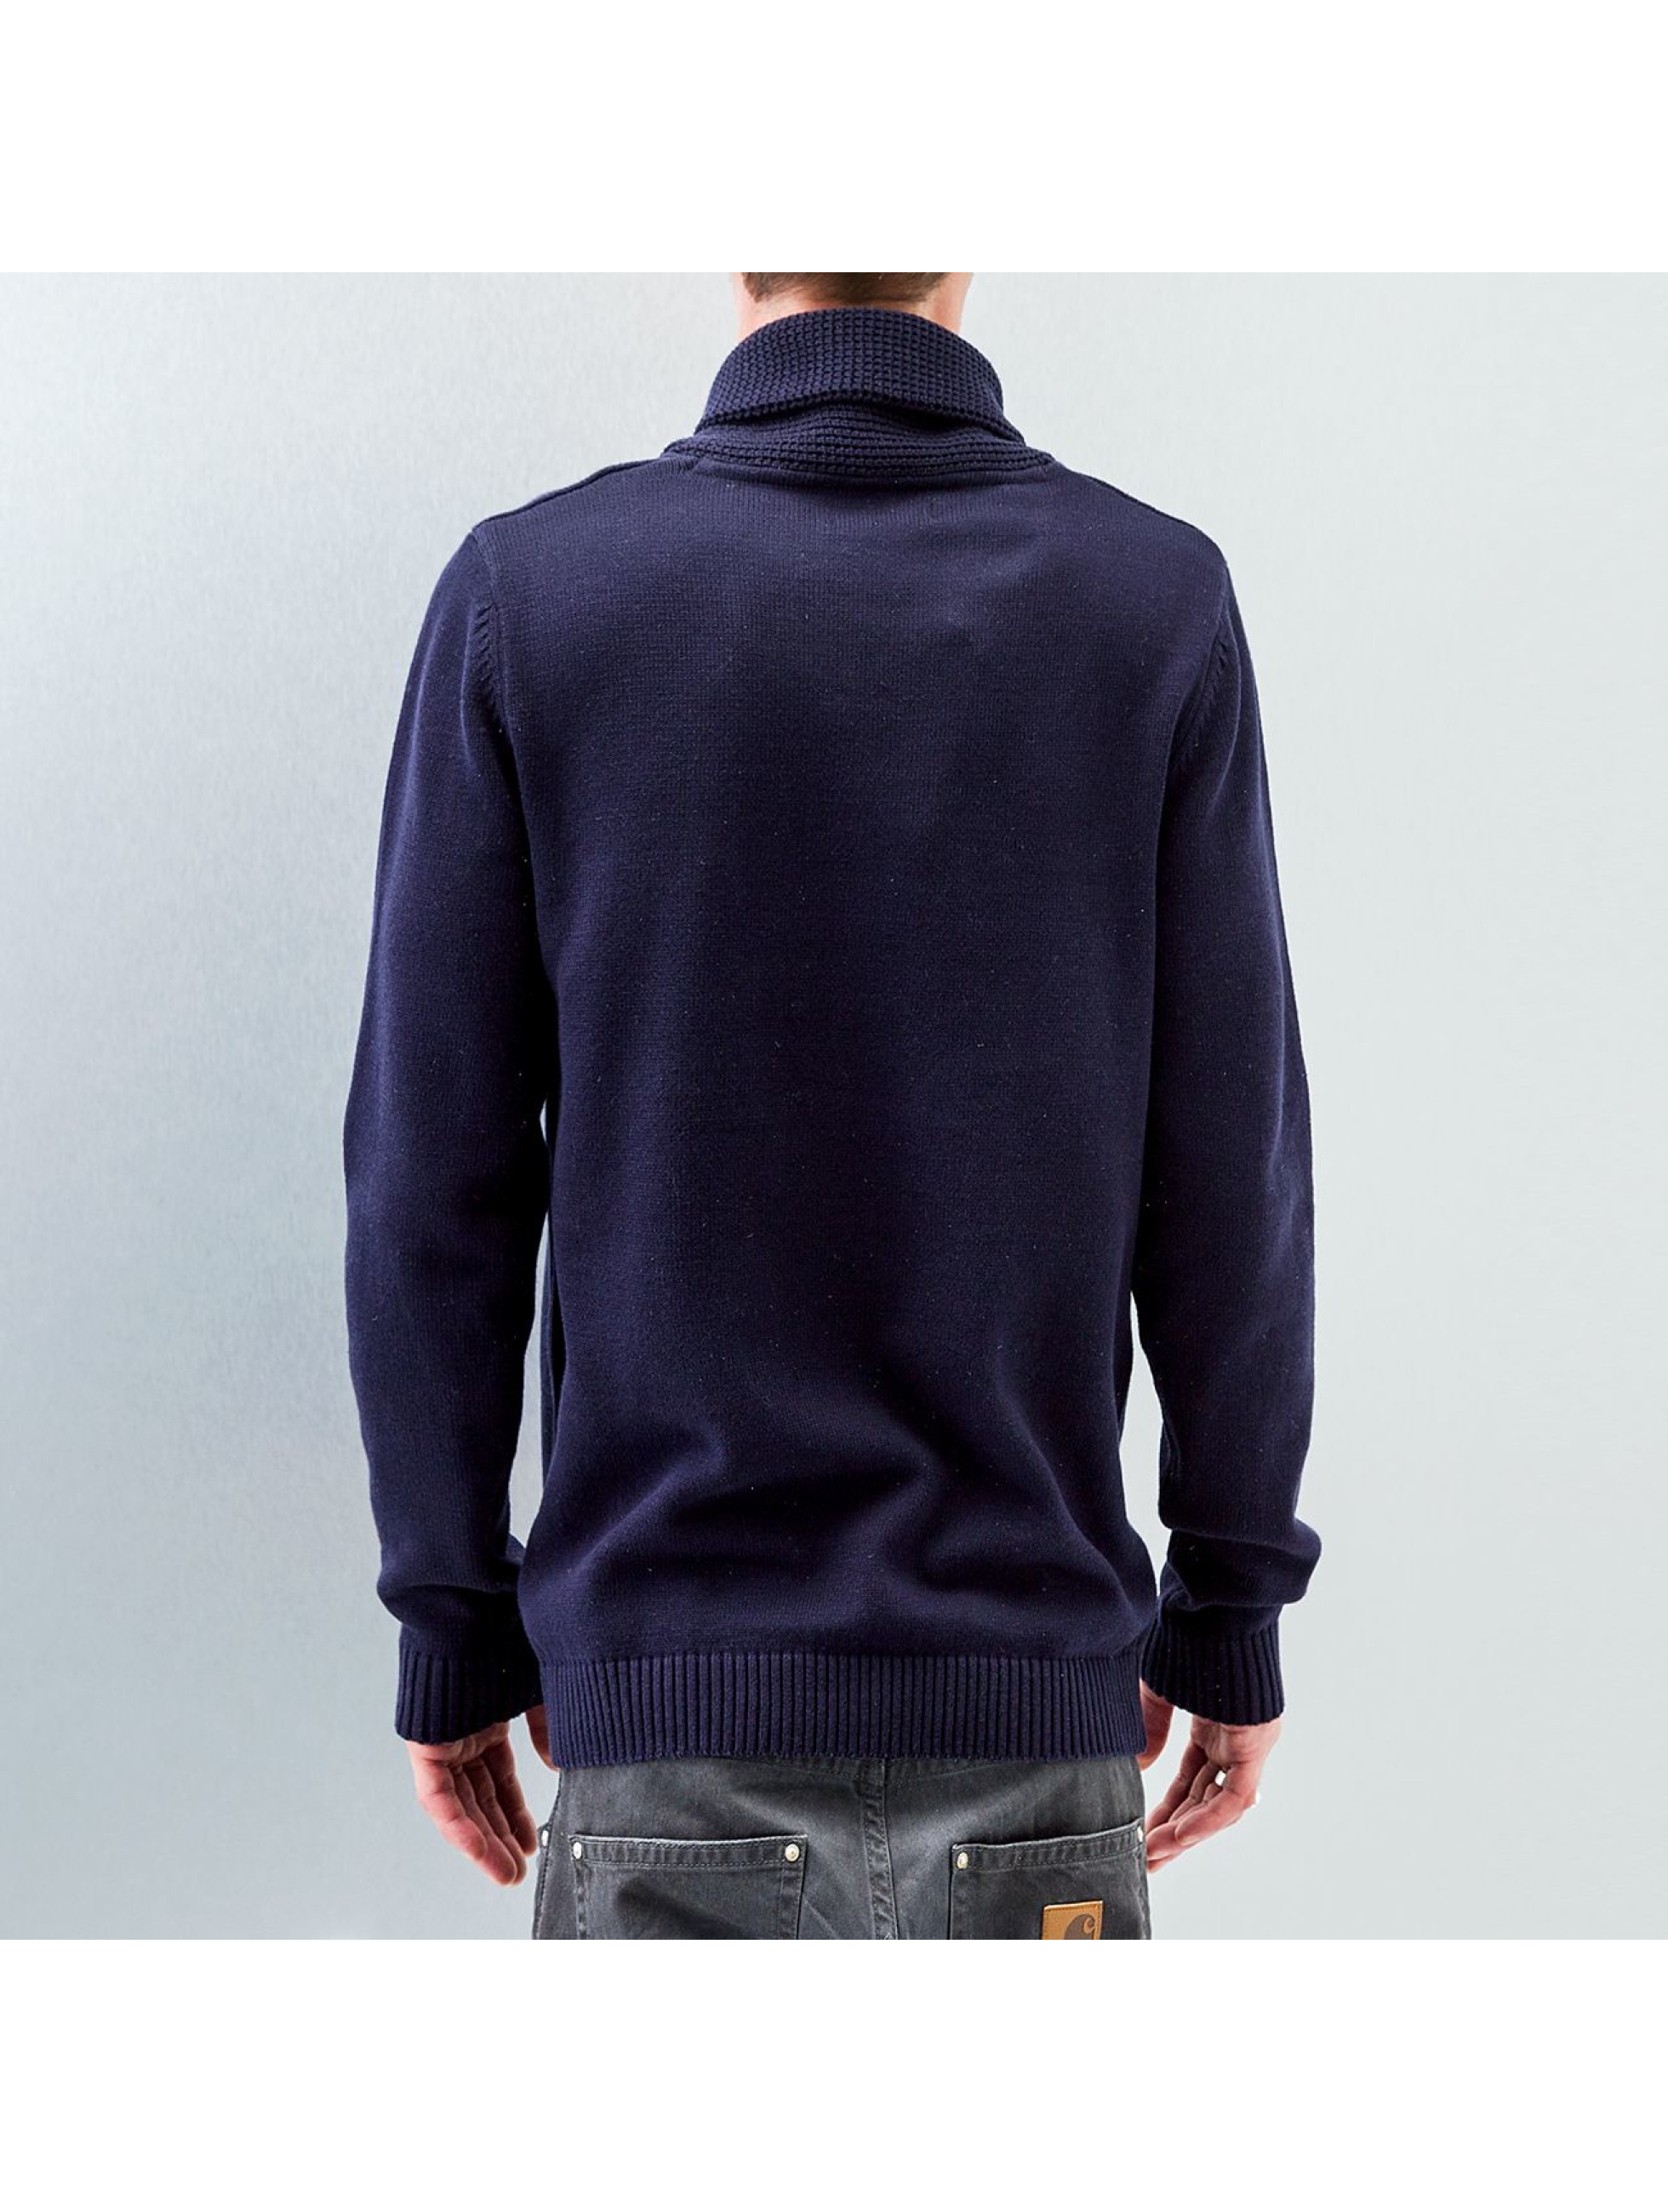 Selected Пуловер Chip синий